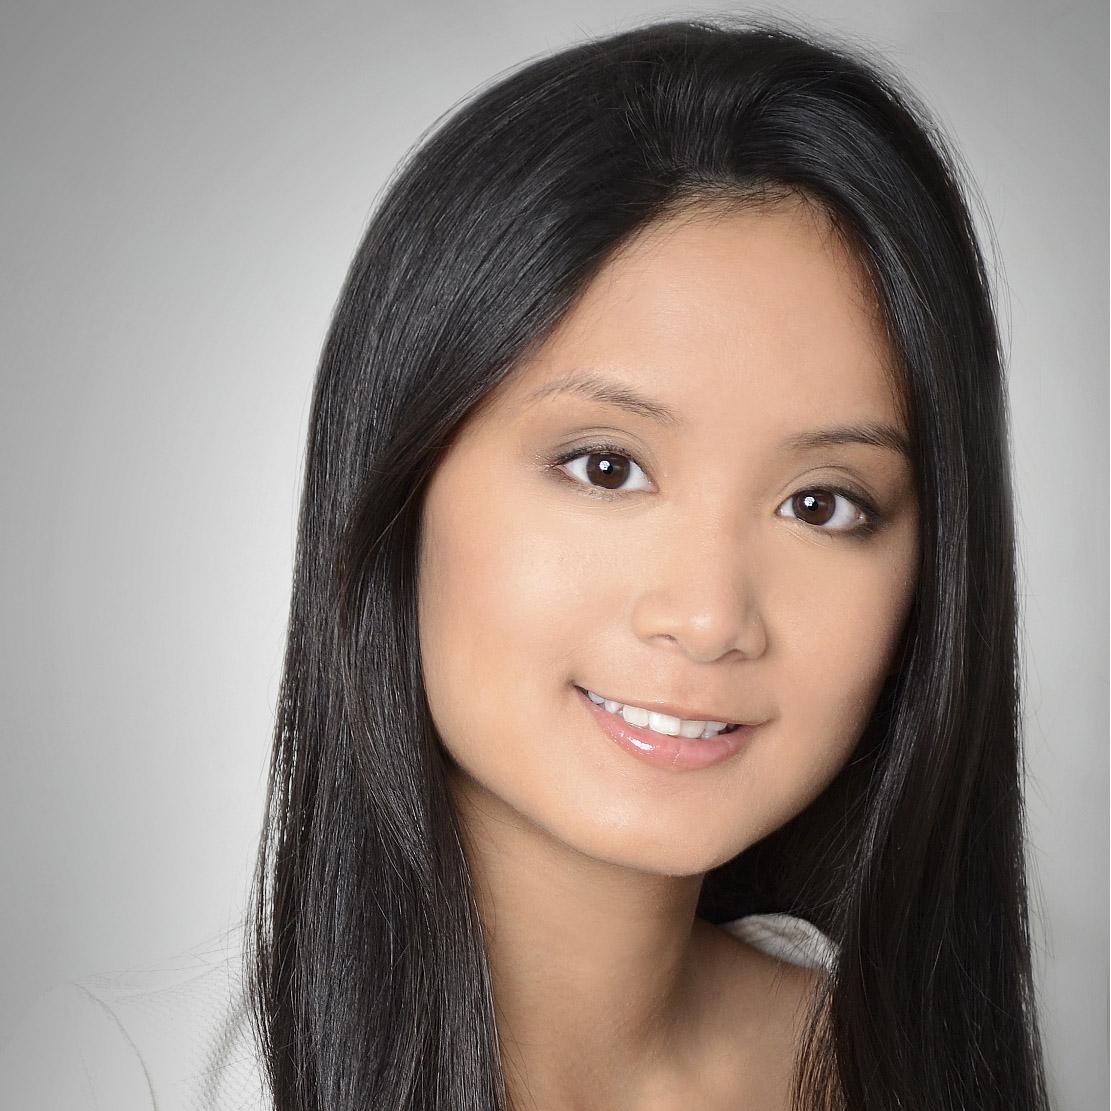 Maddie Bautista (she/her), 2017